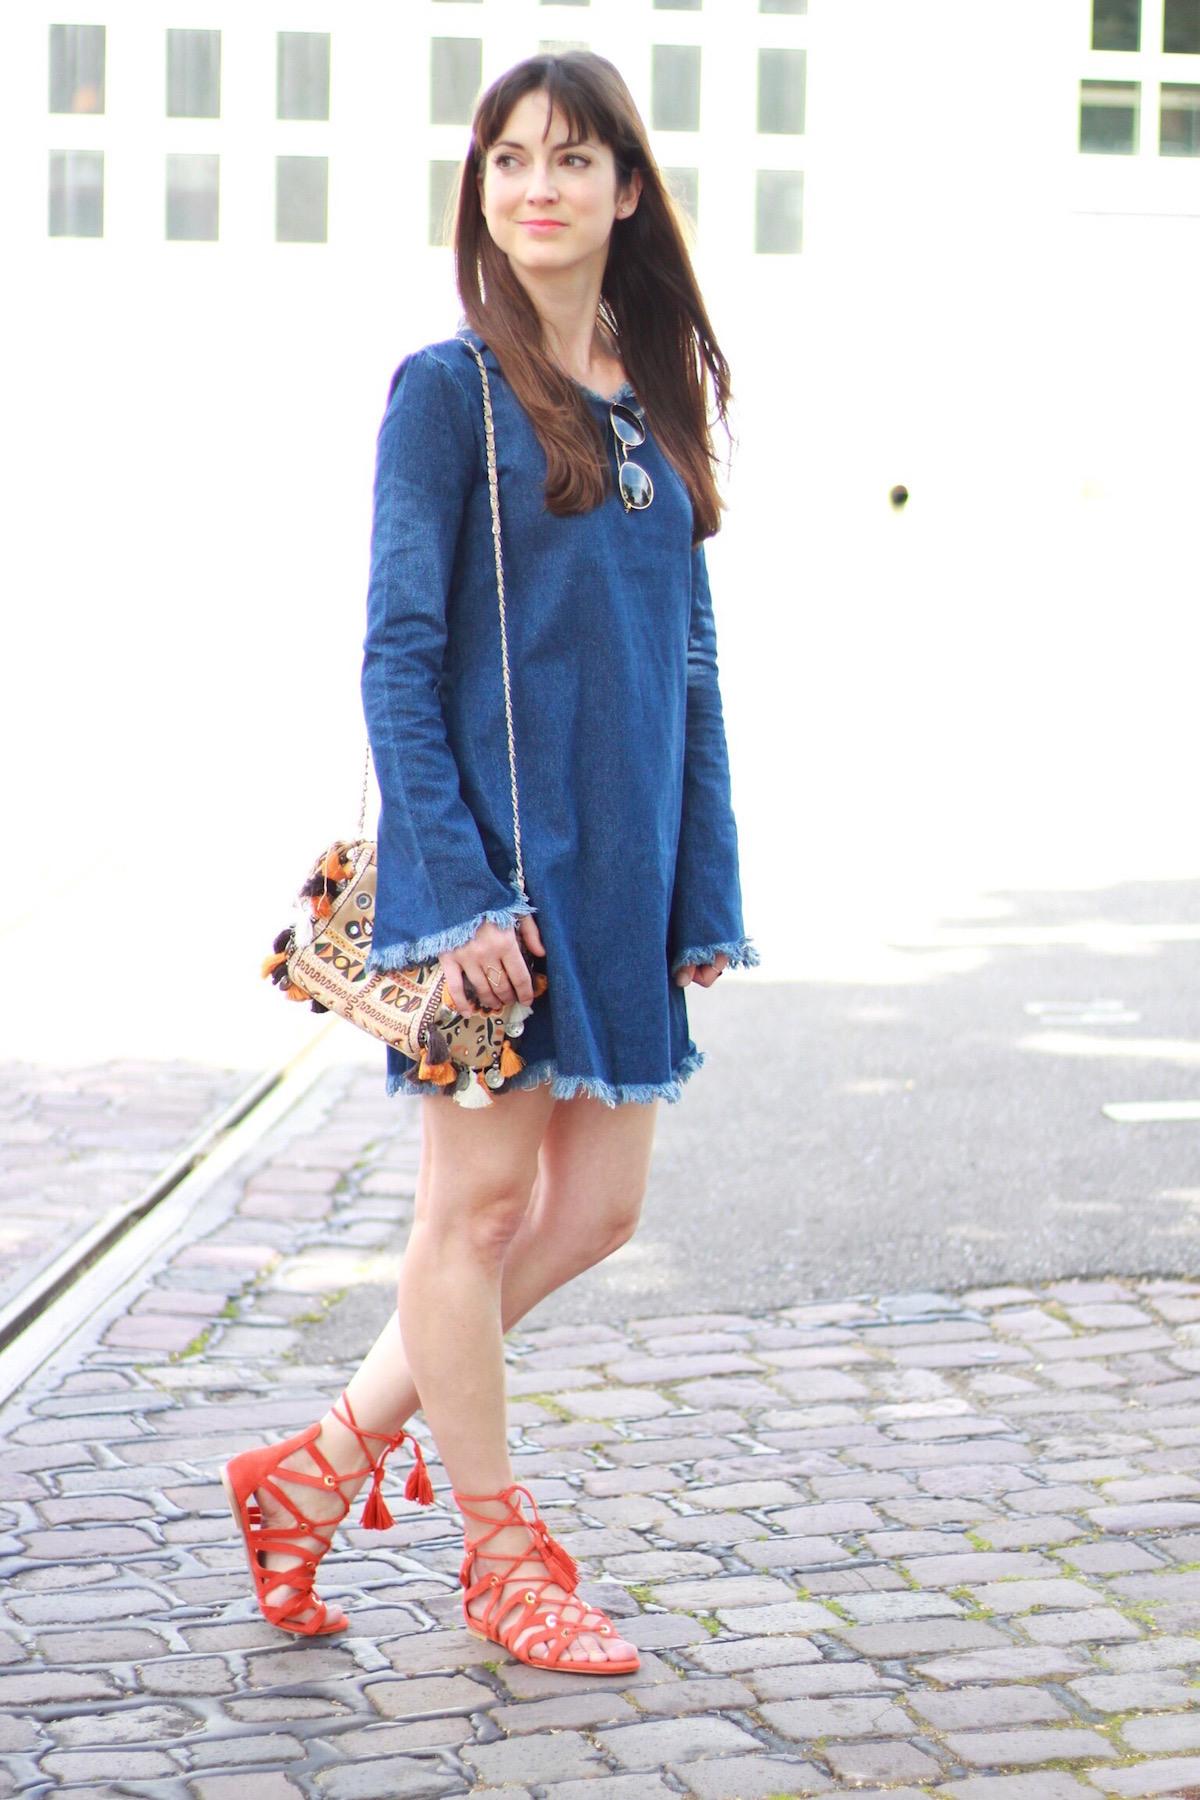 Outfit Fransen Jeanskleid Lace Up Sandalen Orange Und